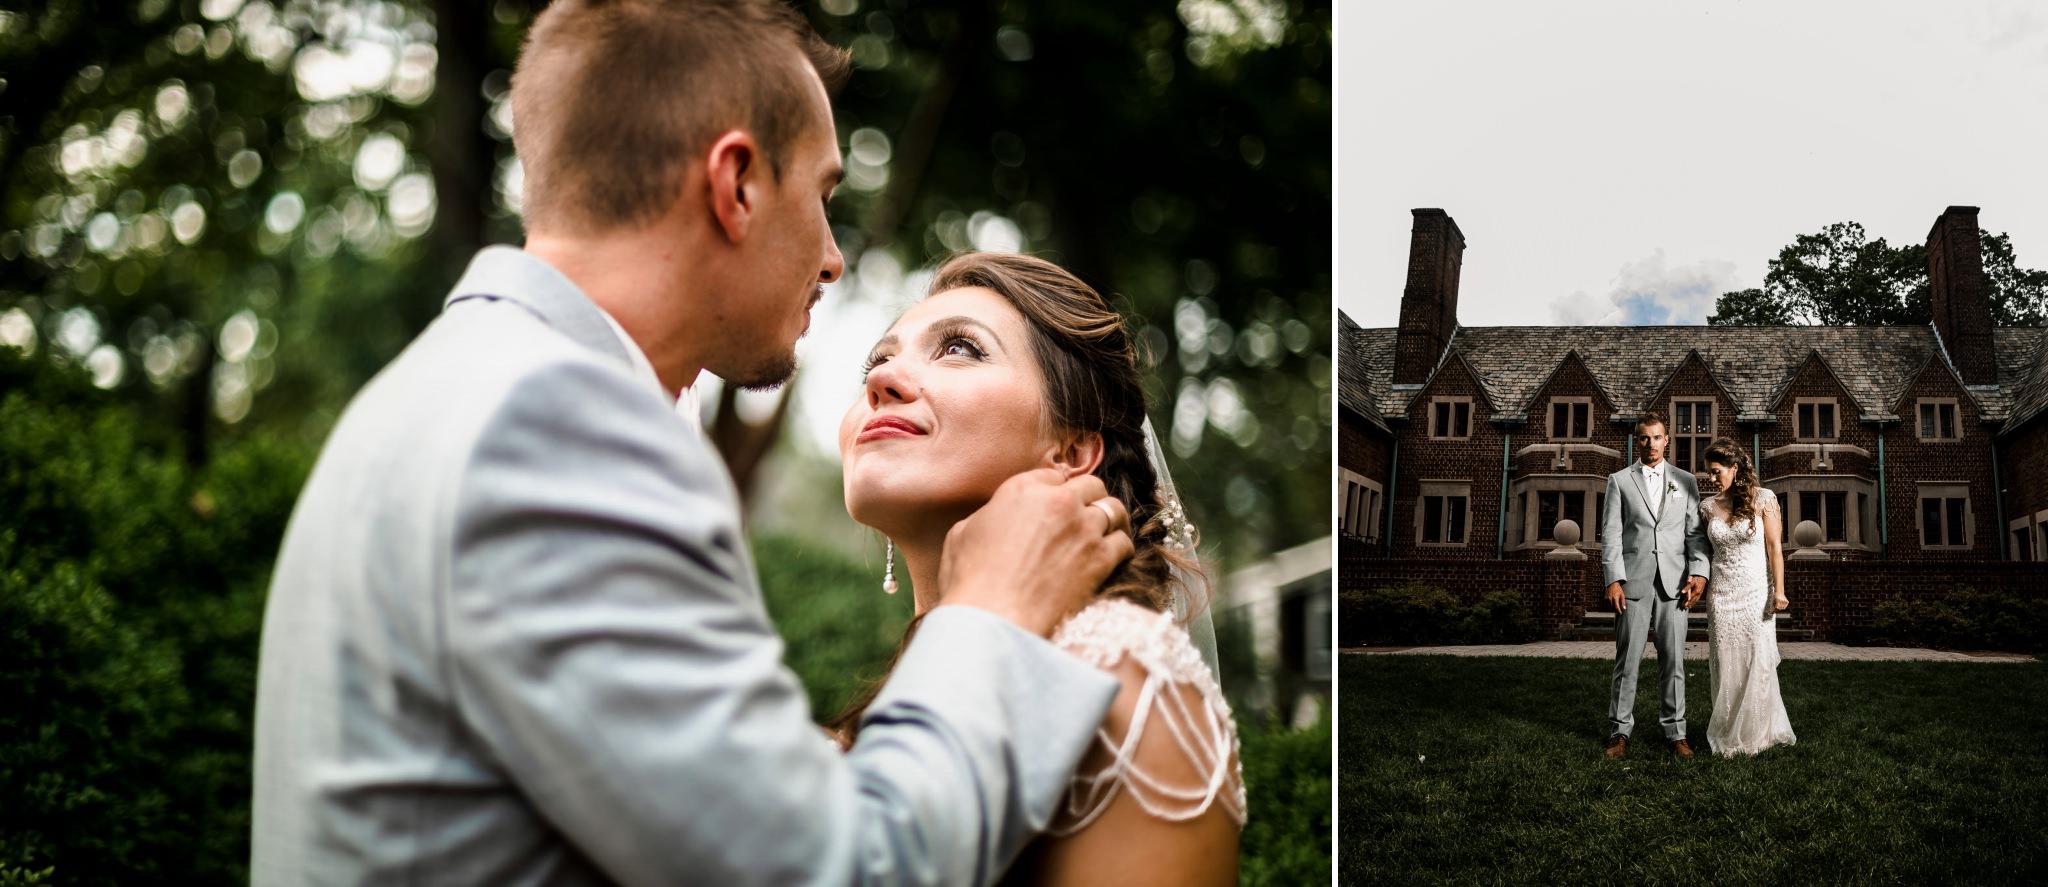 Barbato-Moorestown-Community-House-Wedding-New-Jersey-Photographer-54.JPG